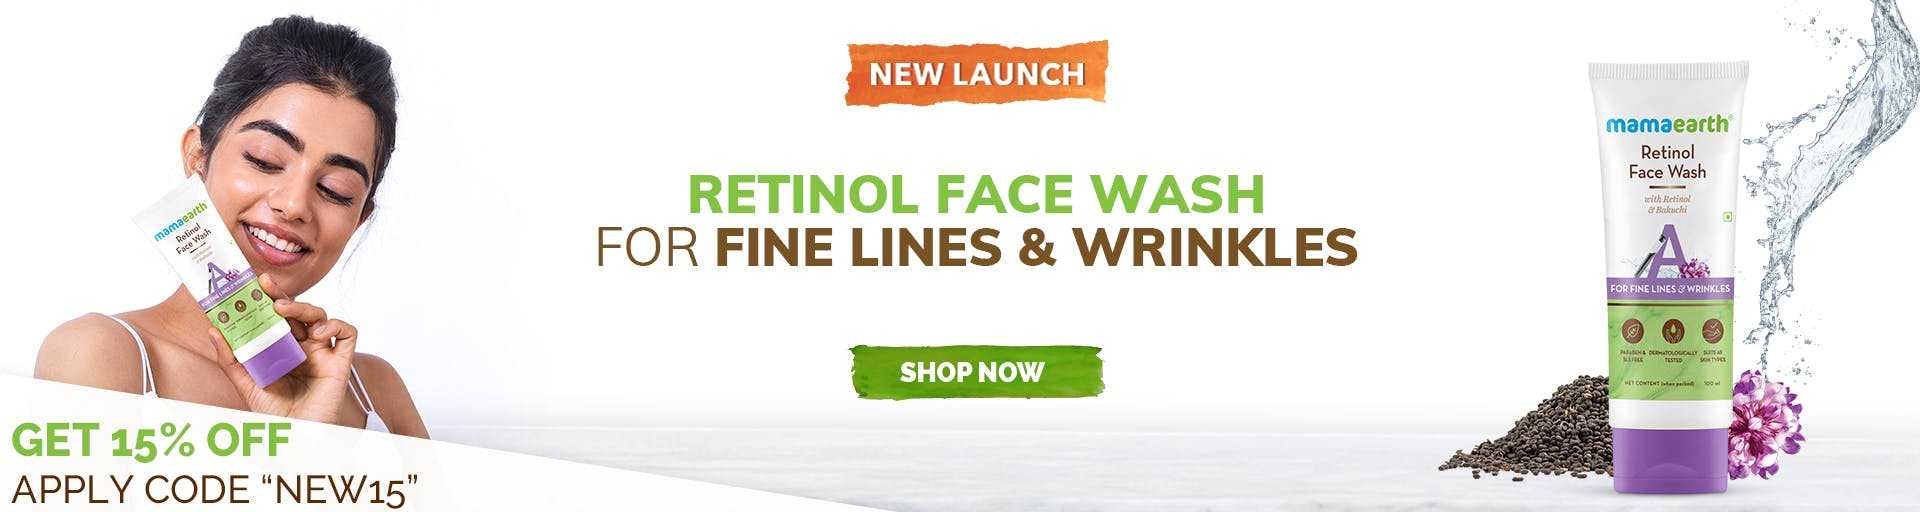 mamaearth.in - MamaEarth Retinol Face Wash @ just ₹299